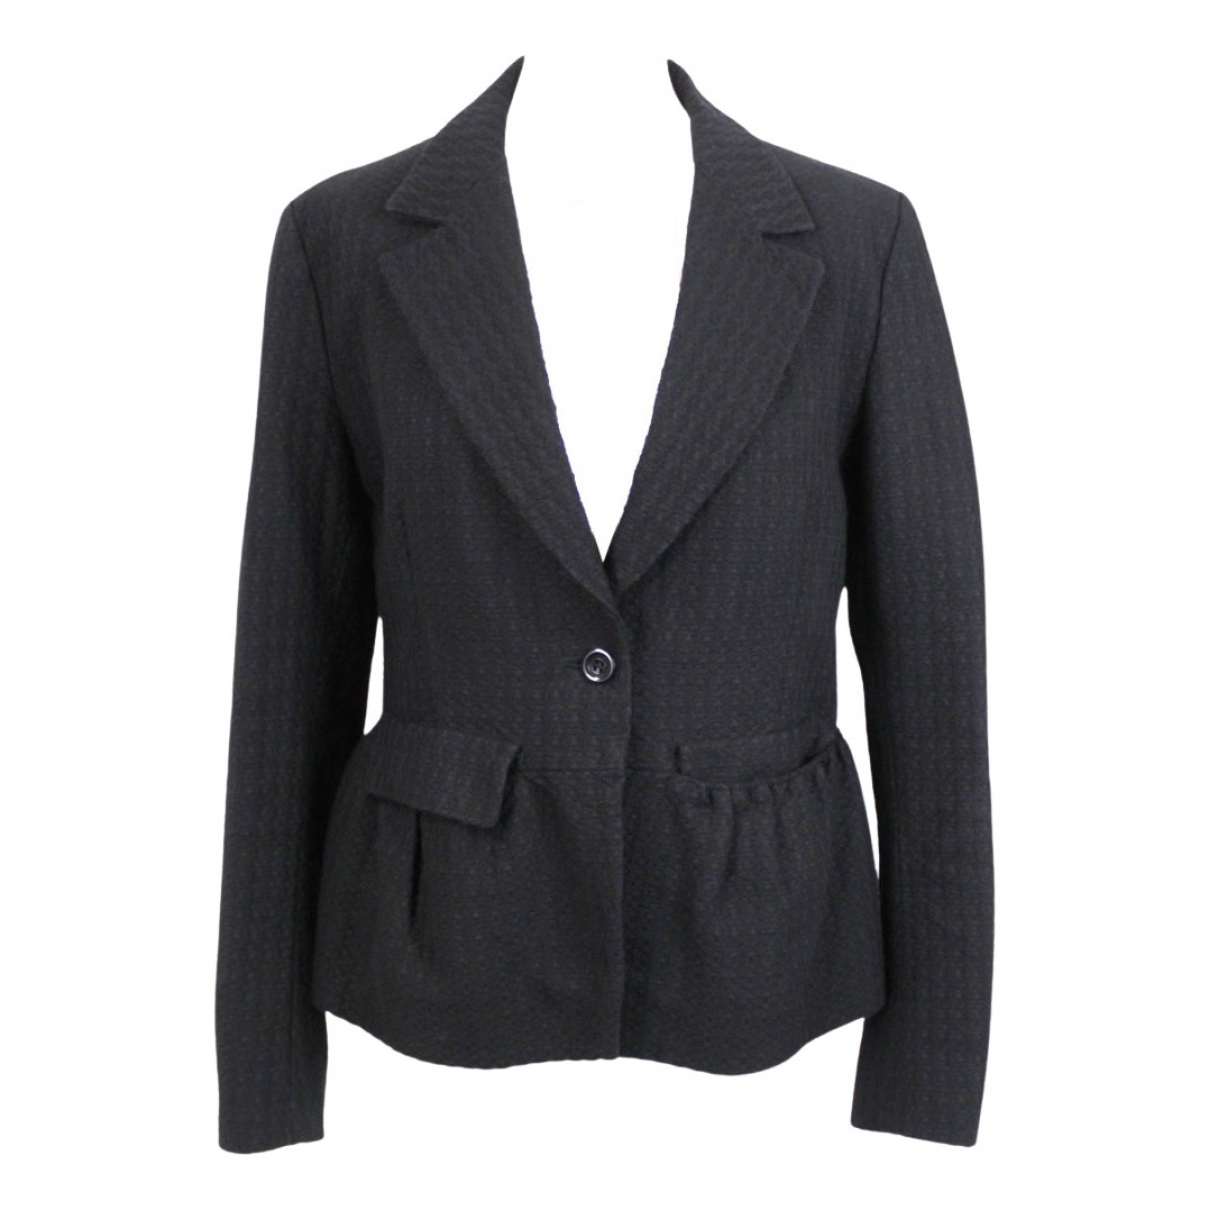 Dries Van Noten N Black Cotton jacket for Women L International